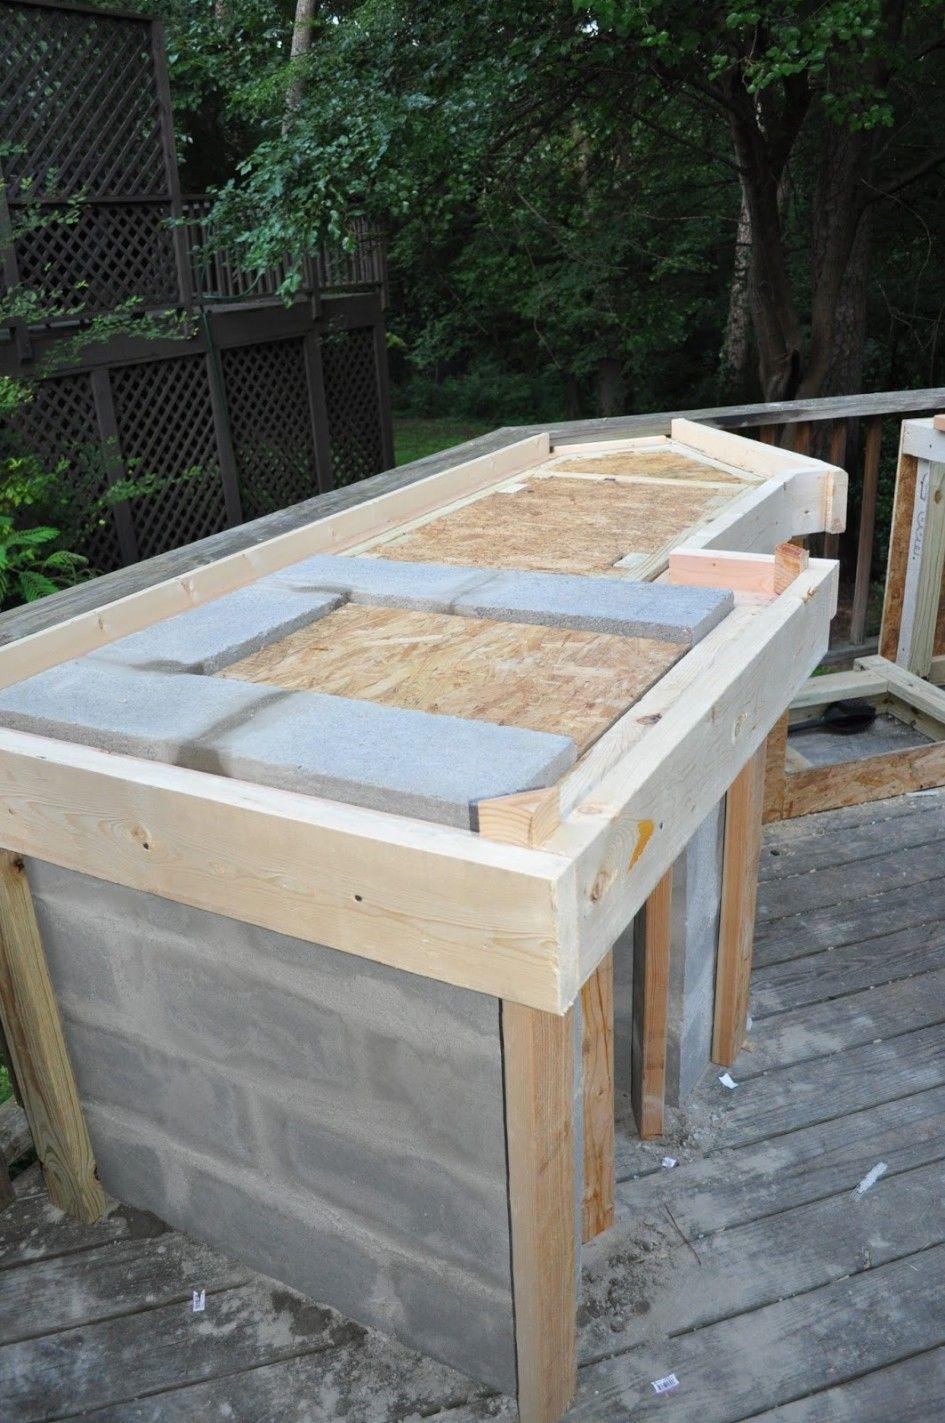 outdoor kitchen countertops Wonderful Outdoor Kitchen Cinder Block Frame With Granite Tile For Outdoor Kitchen Countertop And Combine With